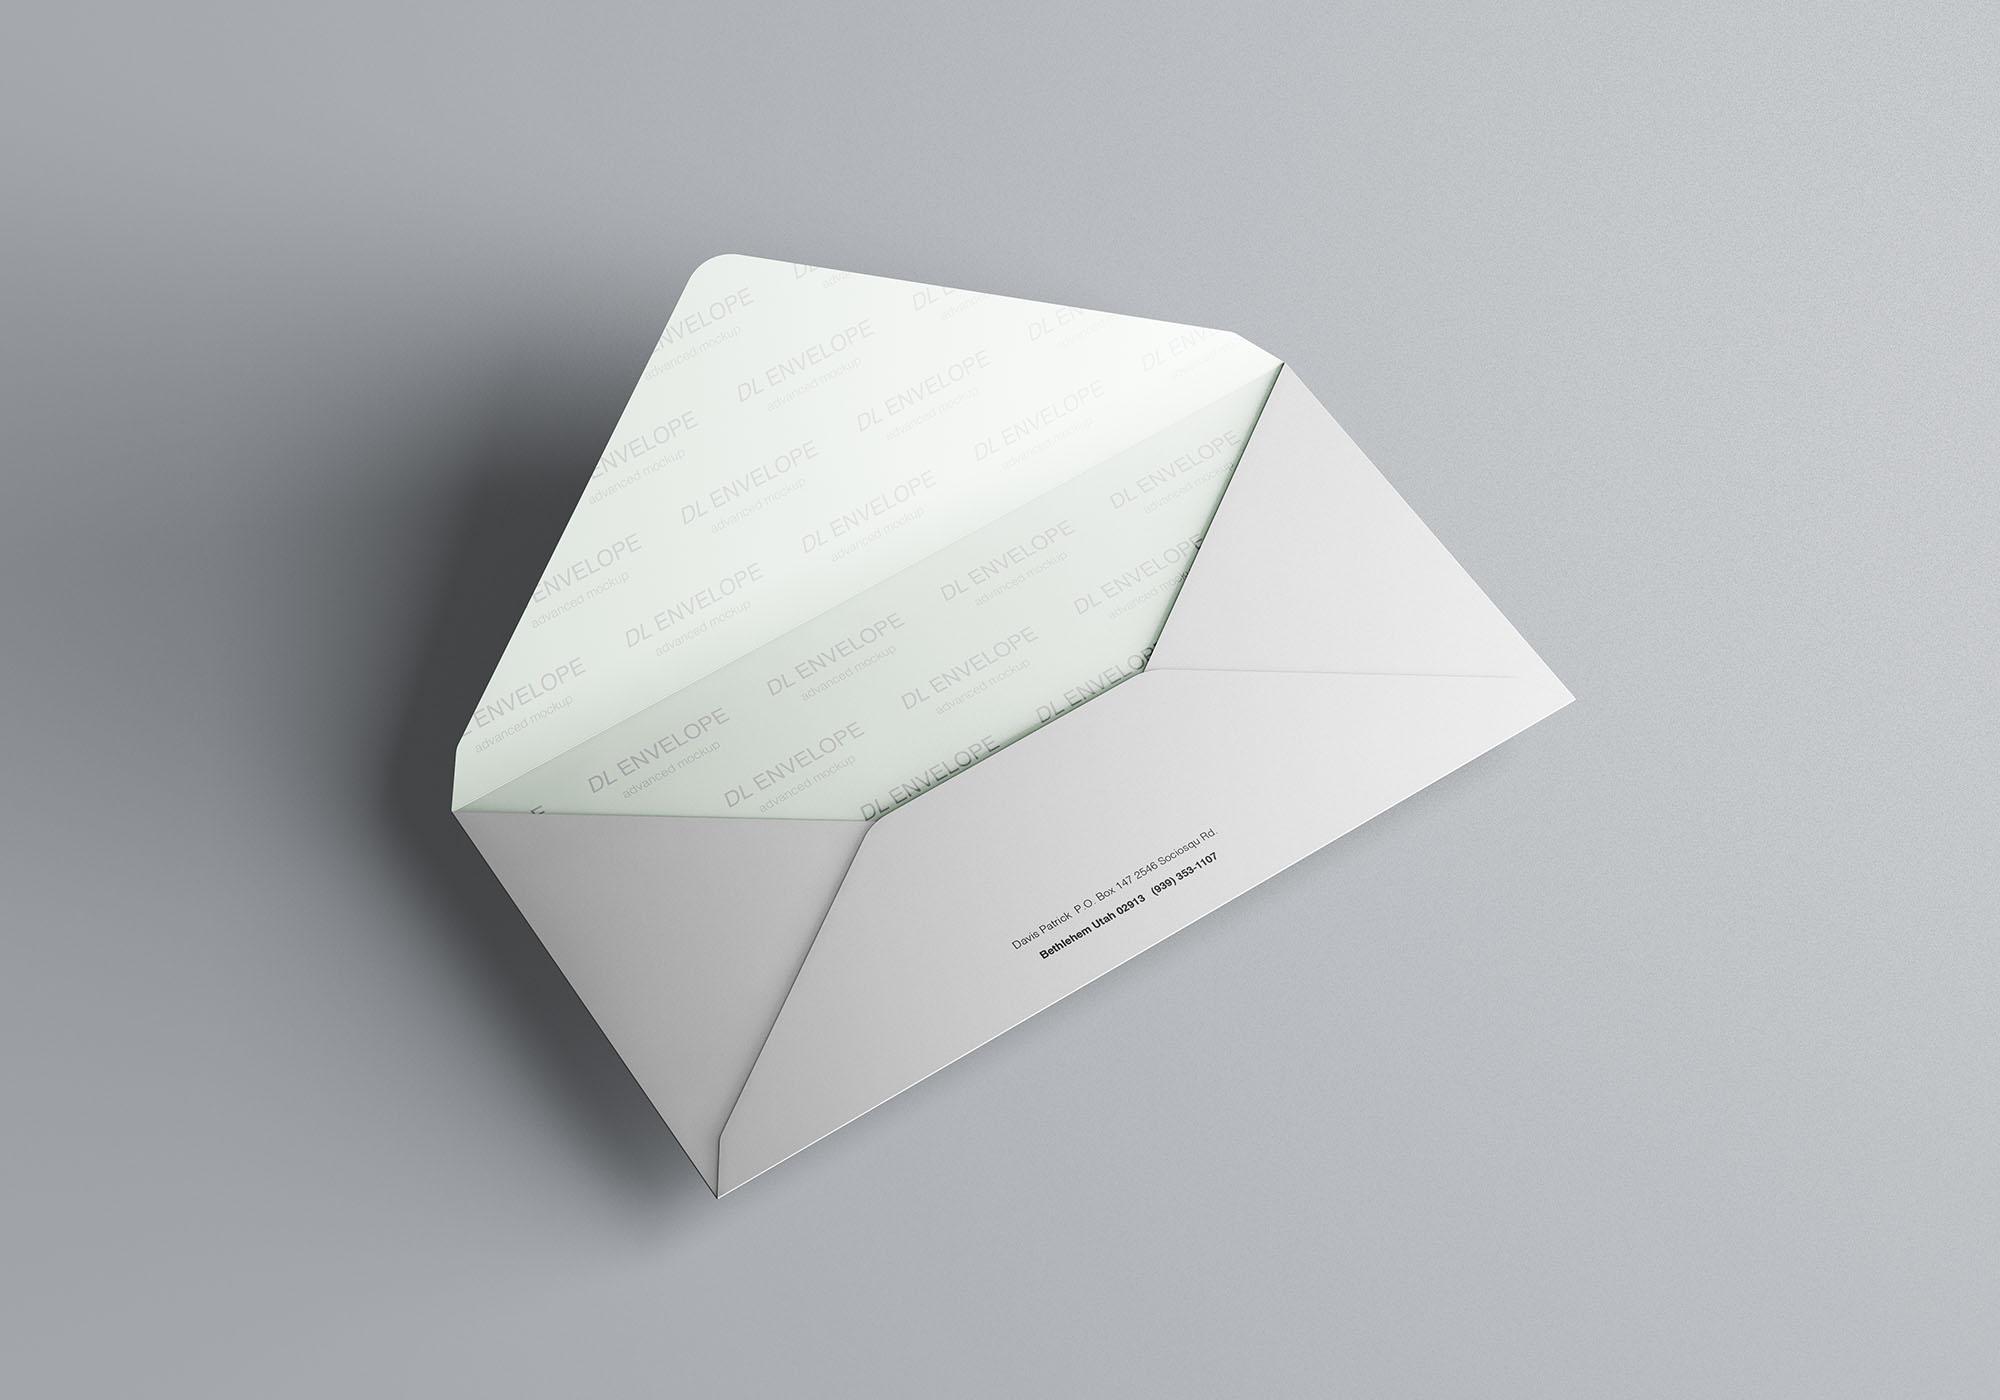 Baronial DL Envelope Mockup 3